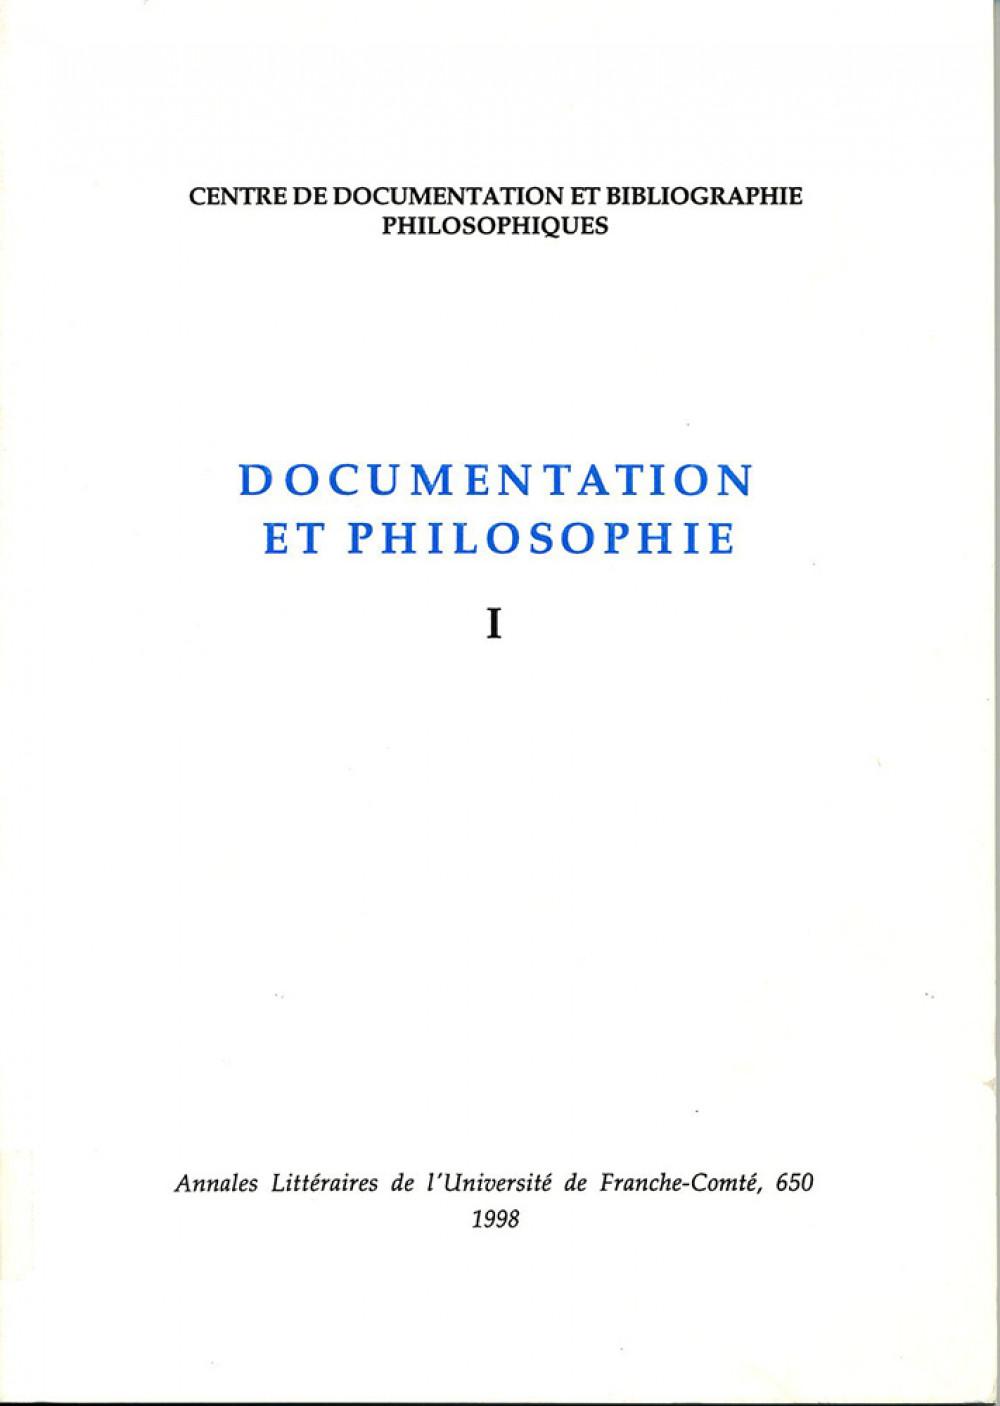 Documentation et philosophie I